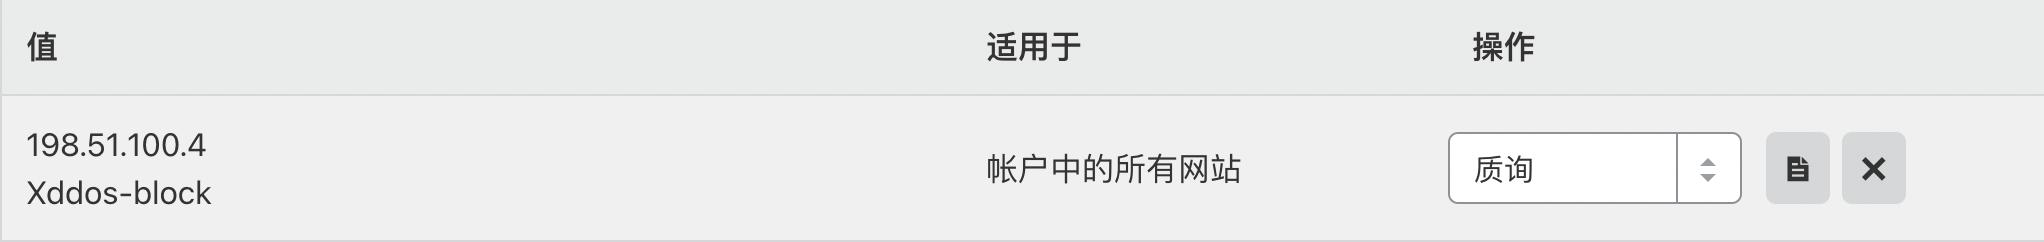 Cloudflare dashboard - 防火墙 - 工具.png